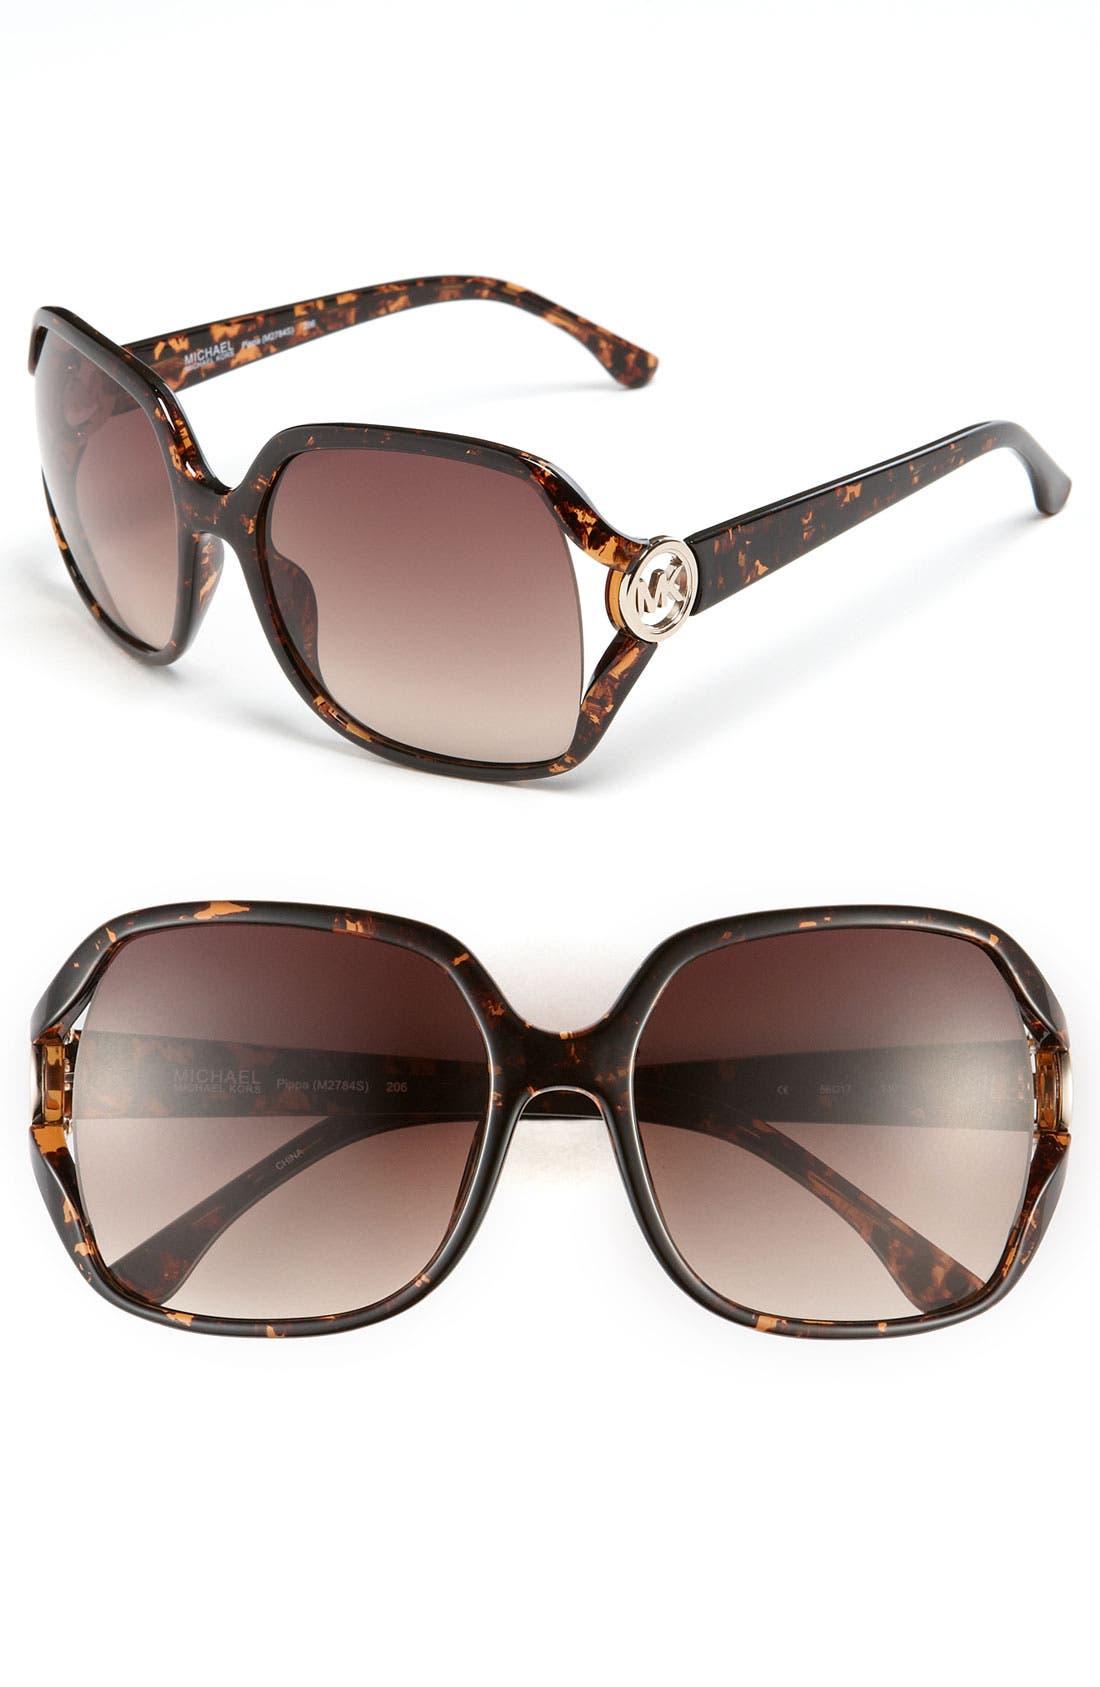 Main Image - MICHAEL Michael Kors 56mm Oversized Sunglasses